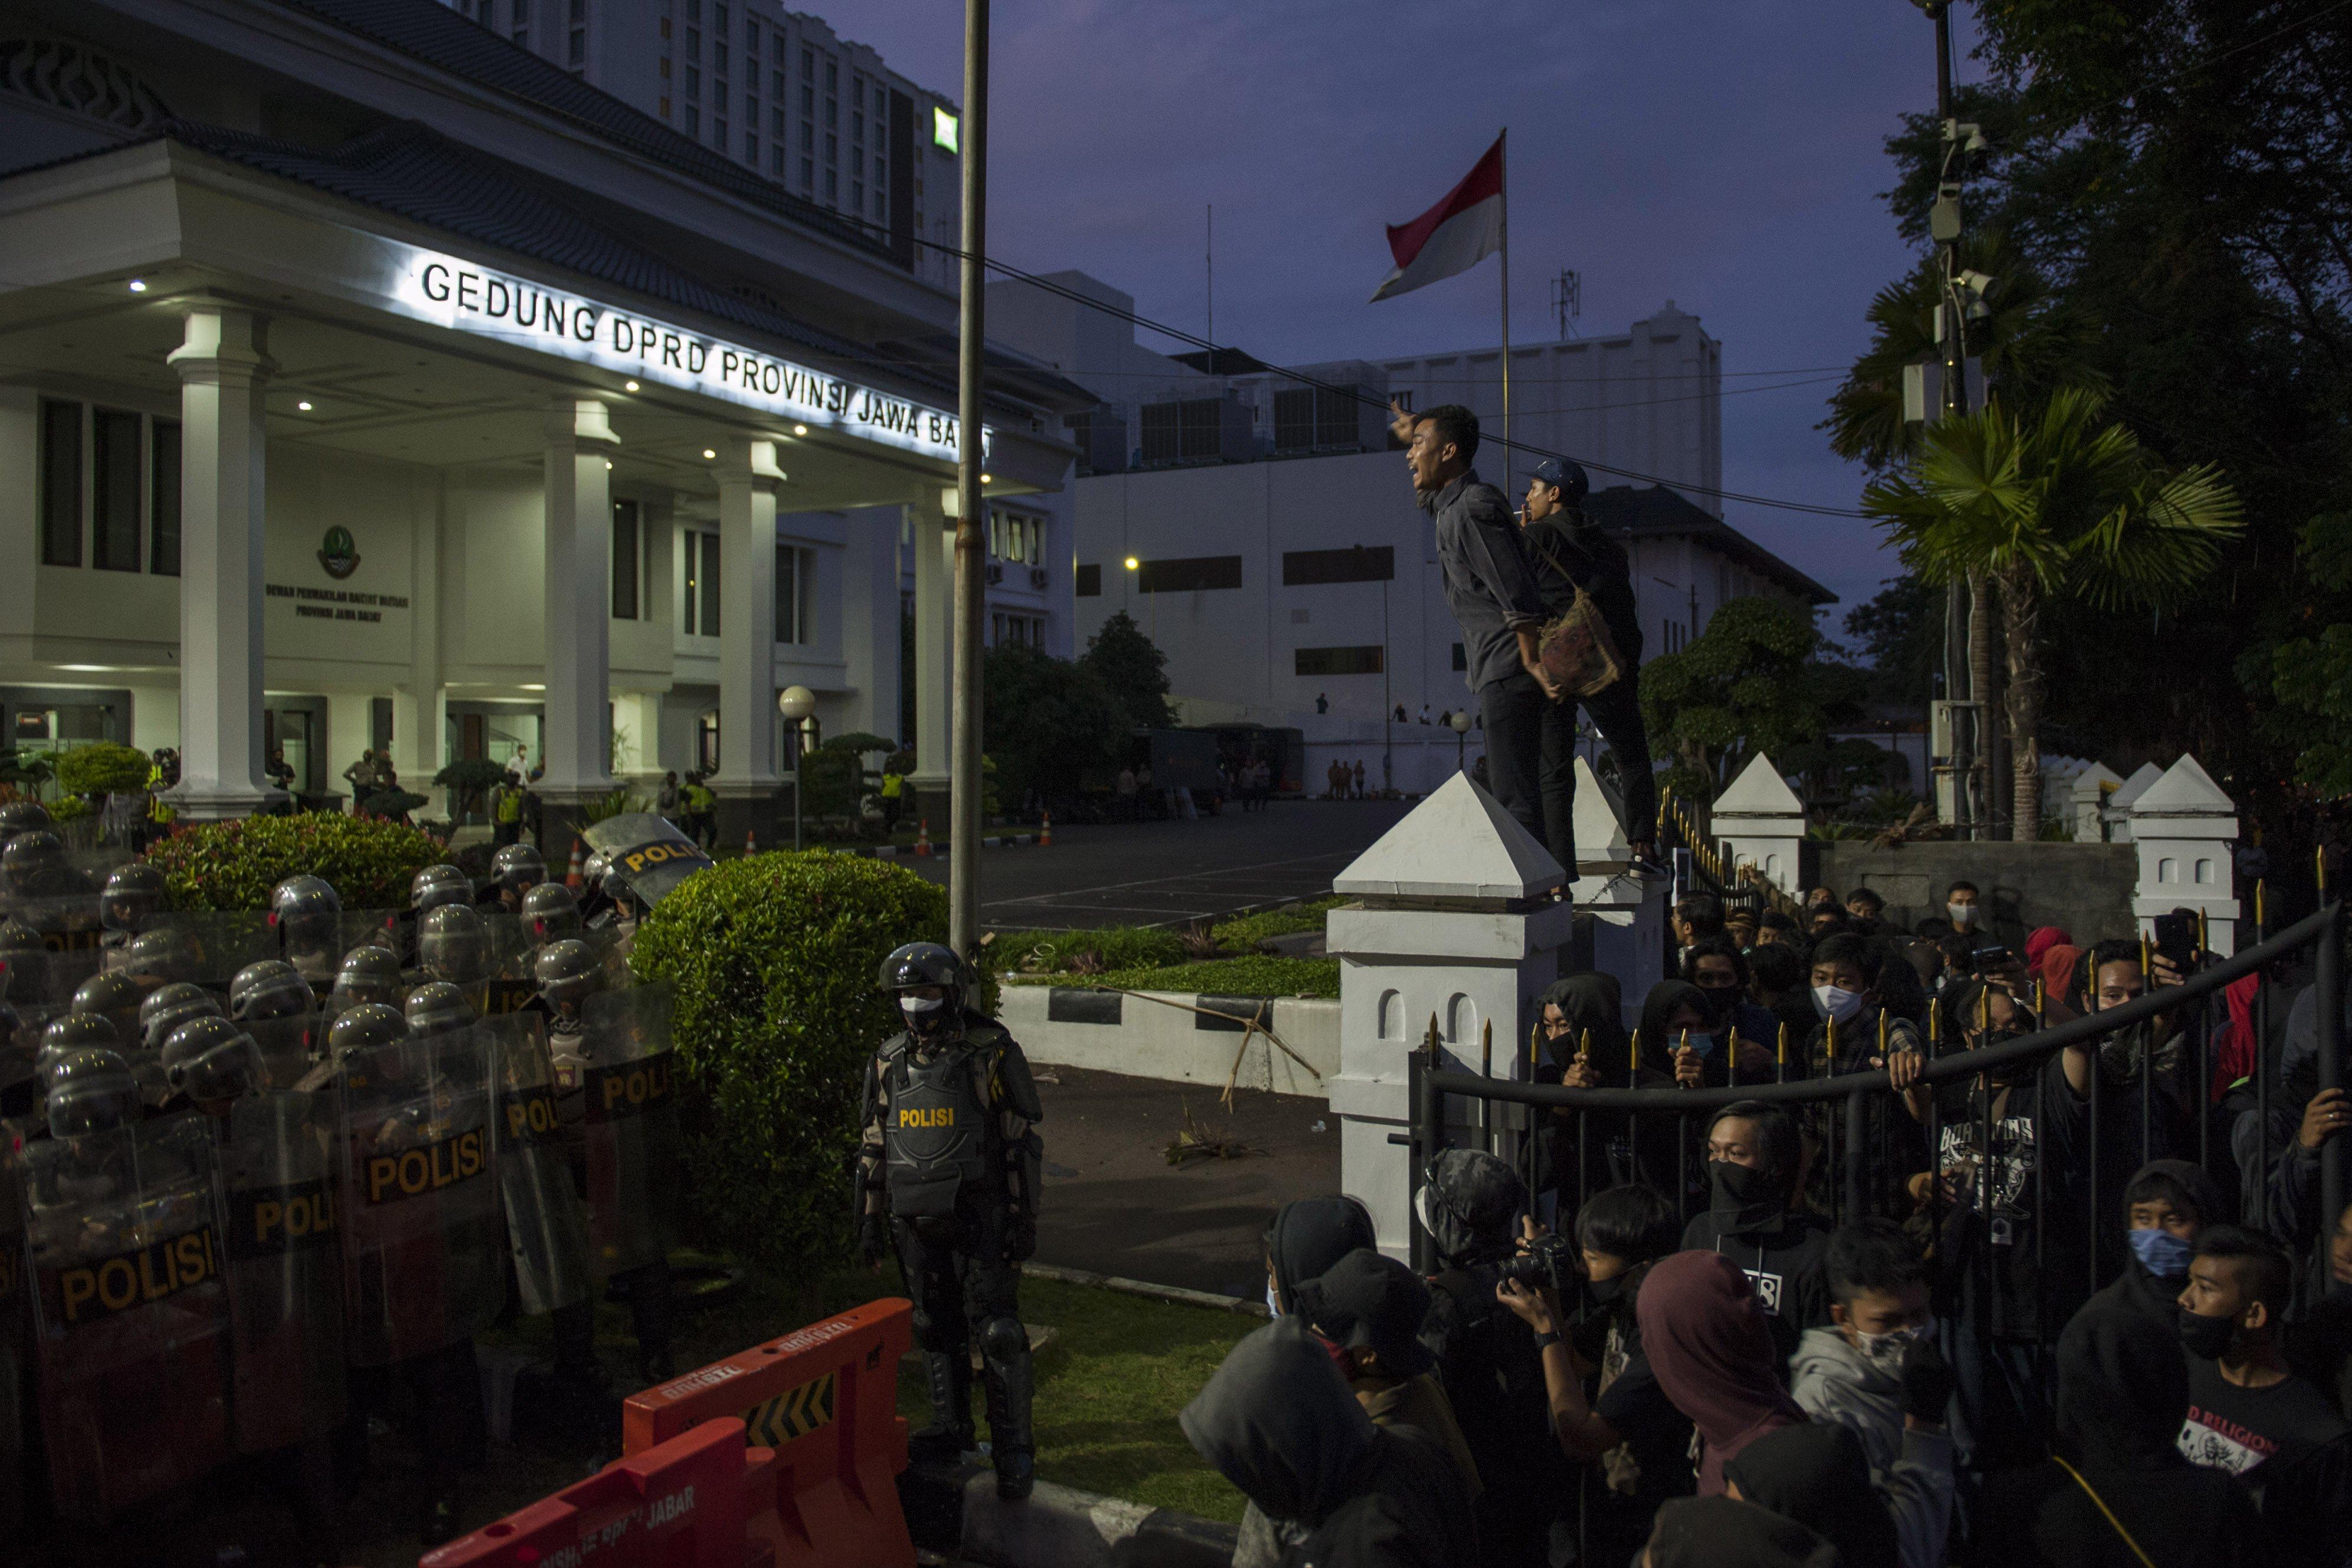 Demonstran melakukan aksi saat unjuk rasa tolak Undang-Undang Cipta Kerja, di Depan Gedung DPRD Jawa Barat, Bandung, Jawa Barat, (6/10/2020). Aksi ini menolak dan menuntut pembatalan serta menuntut pembuatan Perppu untuk Undang-Undang Cipta Kerja tersebut berakhir ricuh. ANTARA FOTO/Arie Nugraha/NA/hp.